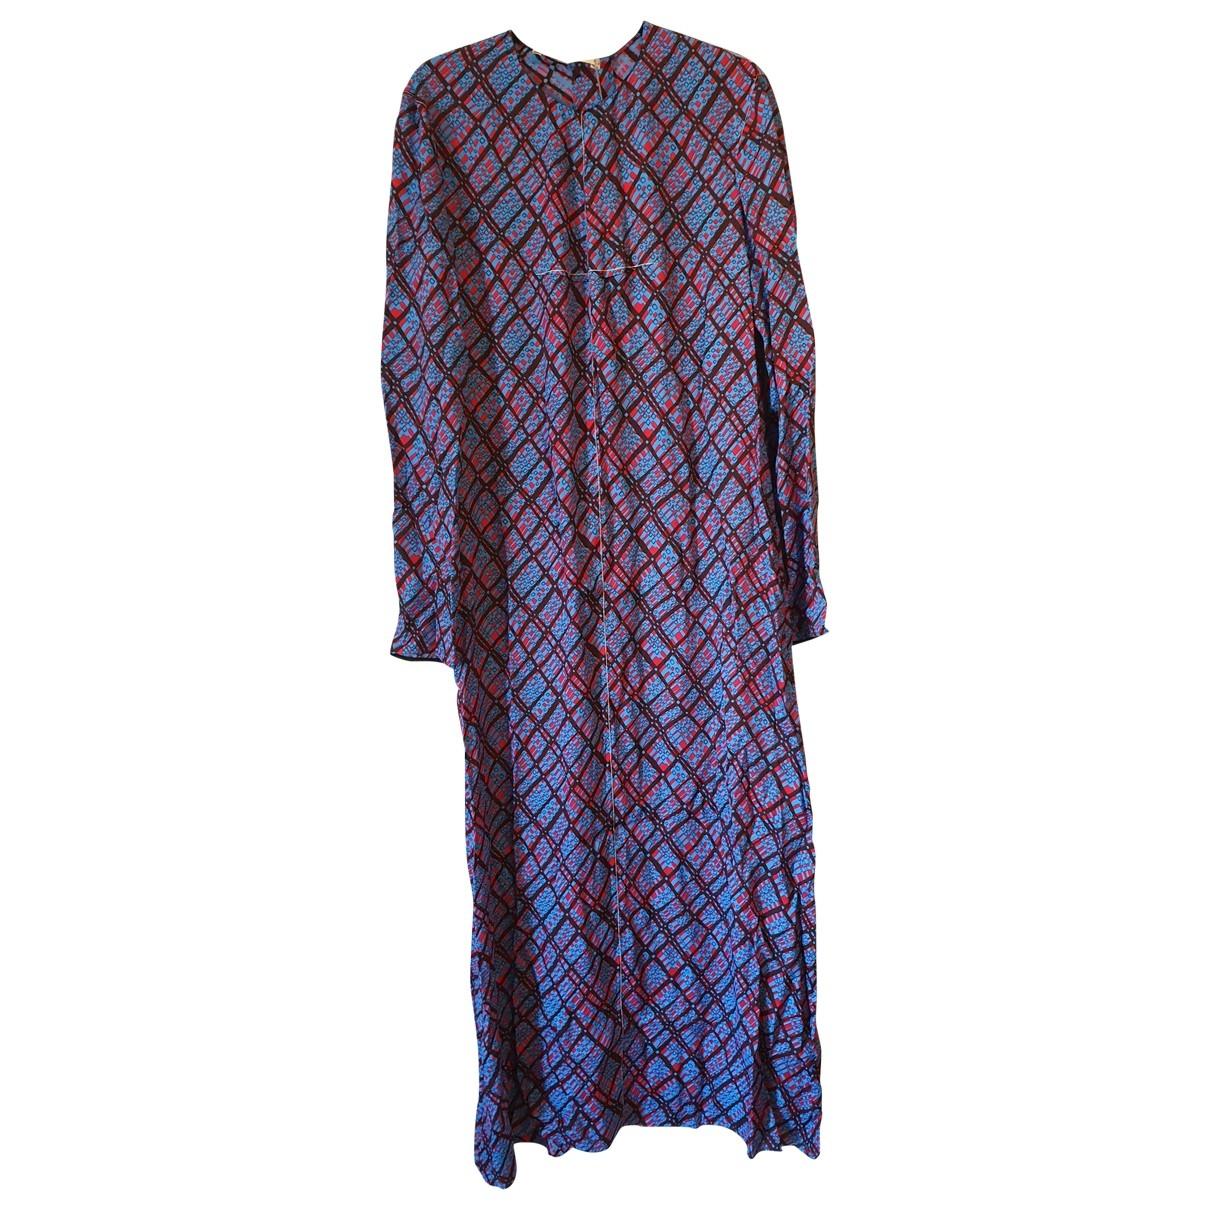 Marni \N Multicolour dress for Women 44 IT